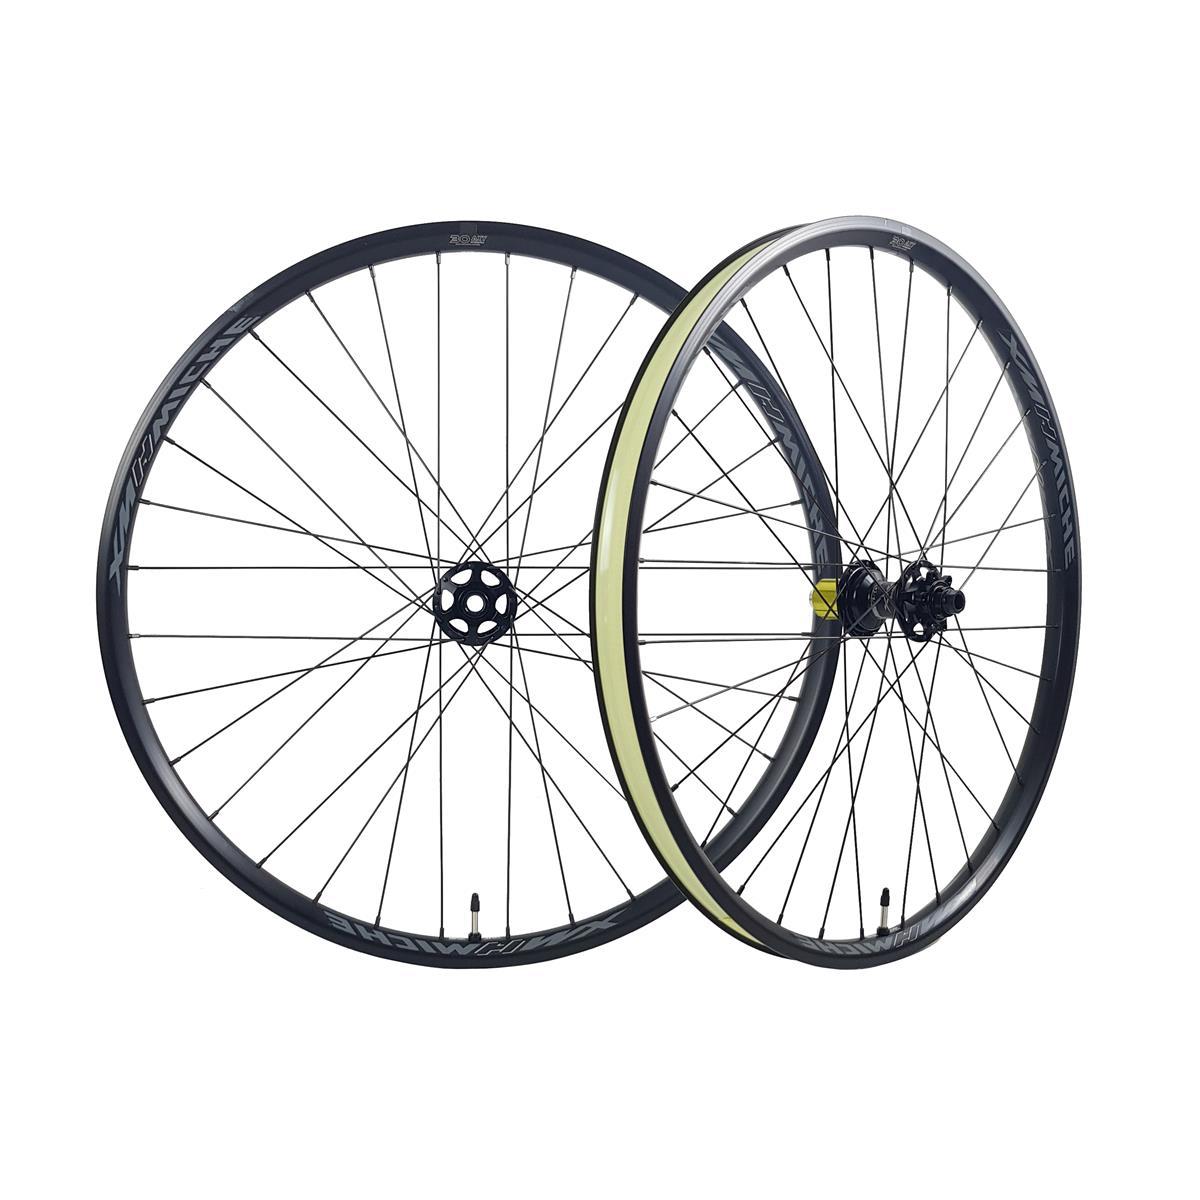 Ebike wheel set XMH R 30 27,5'' Boost inner bead width 30mm Shimano HG 10-11s TR